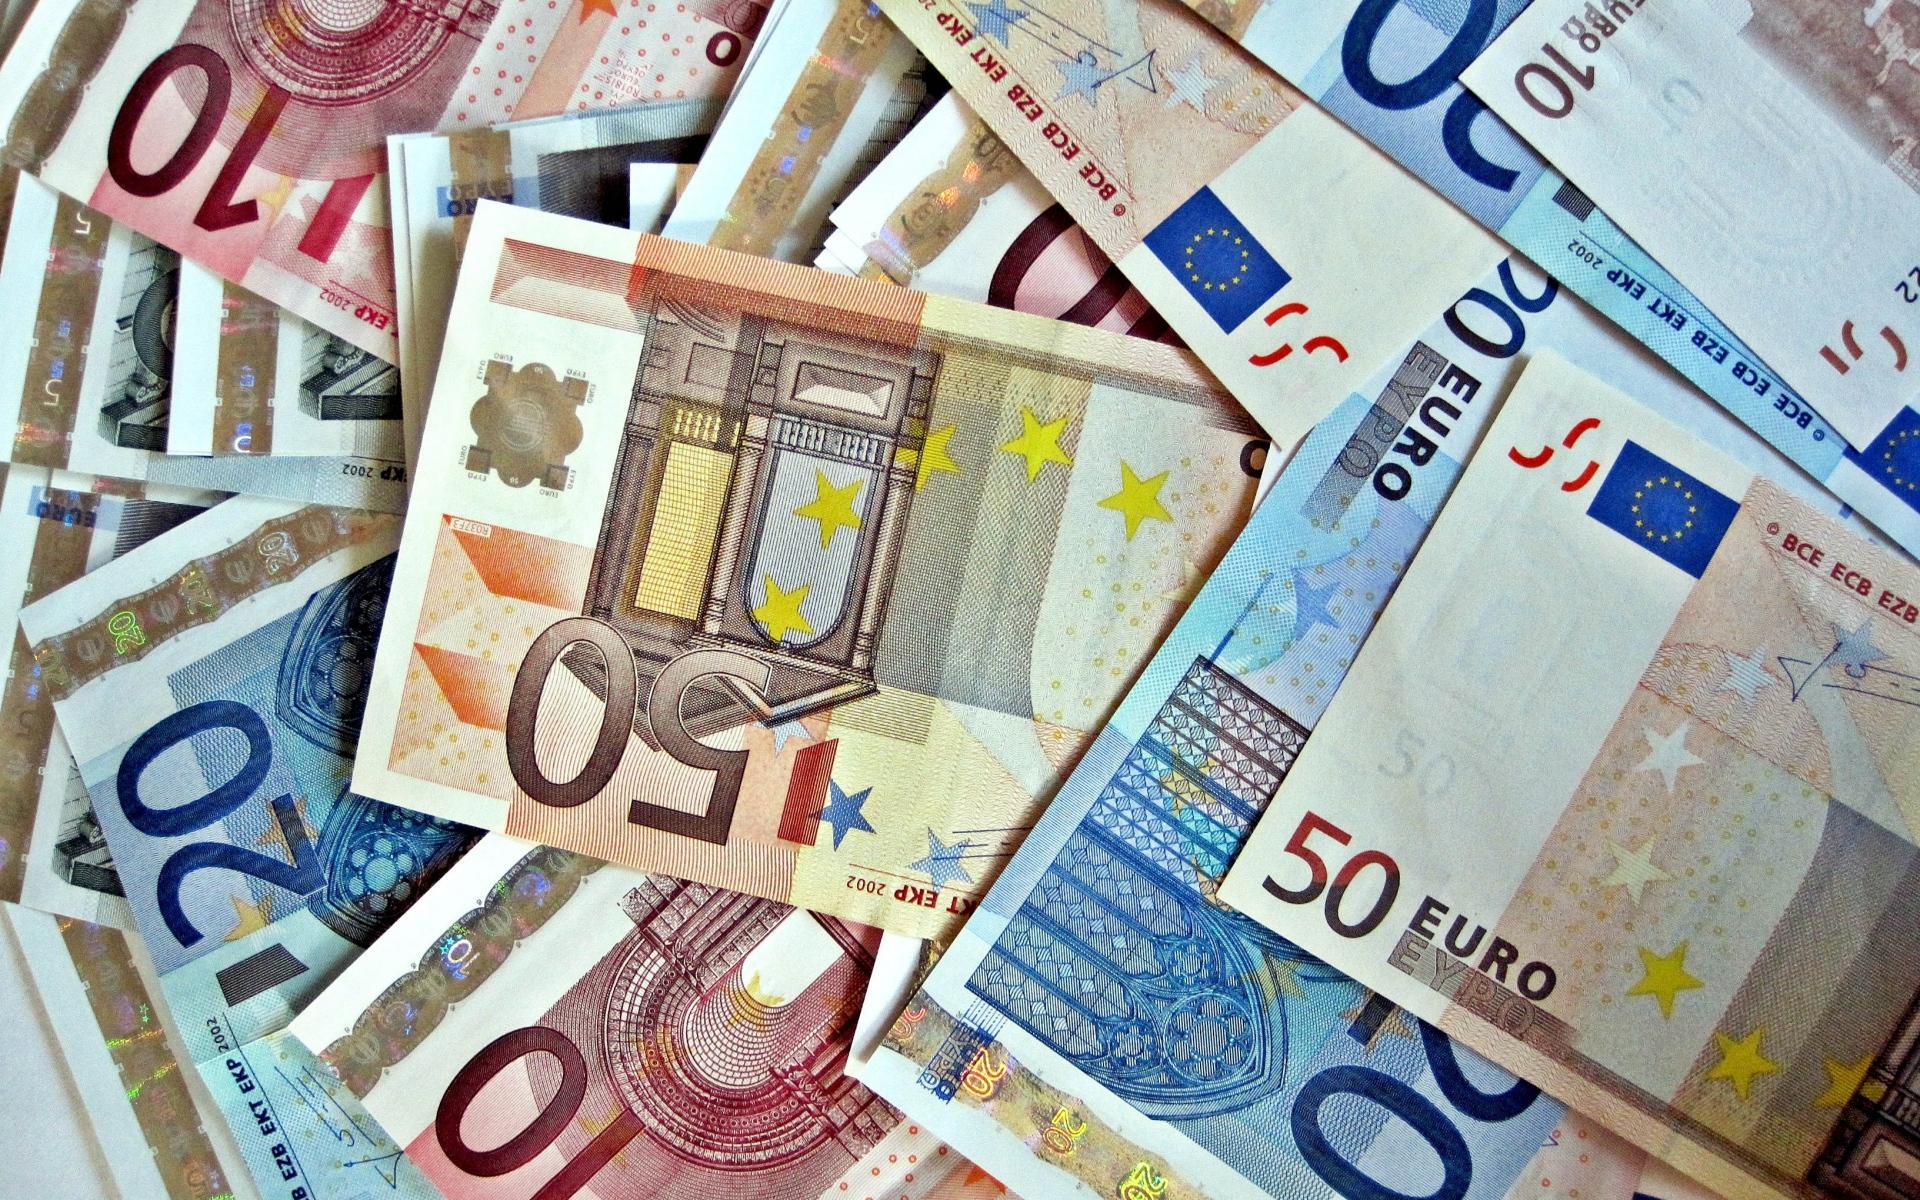 nicholas sarkozy, frankrig, libyen, muammar gaddafi, penge, euro, valg, valgstøtte, valgkamp, penge, økonomi, politi